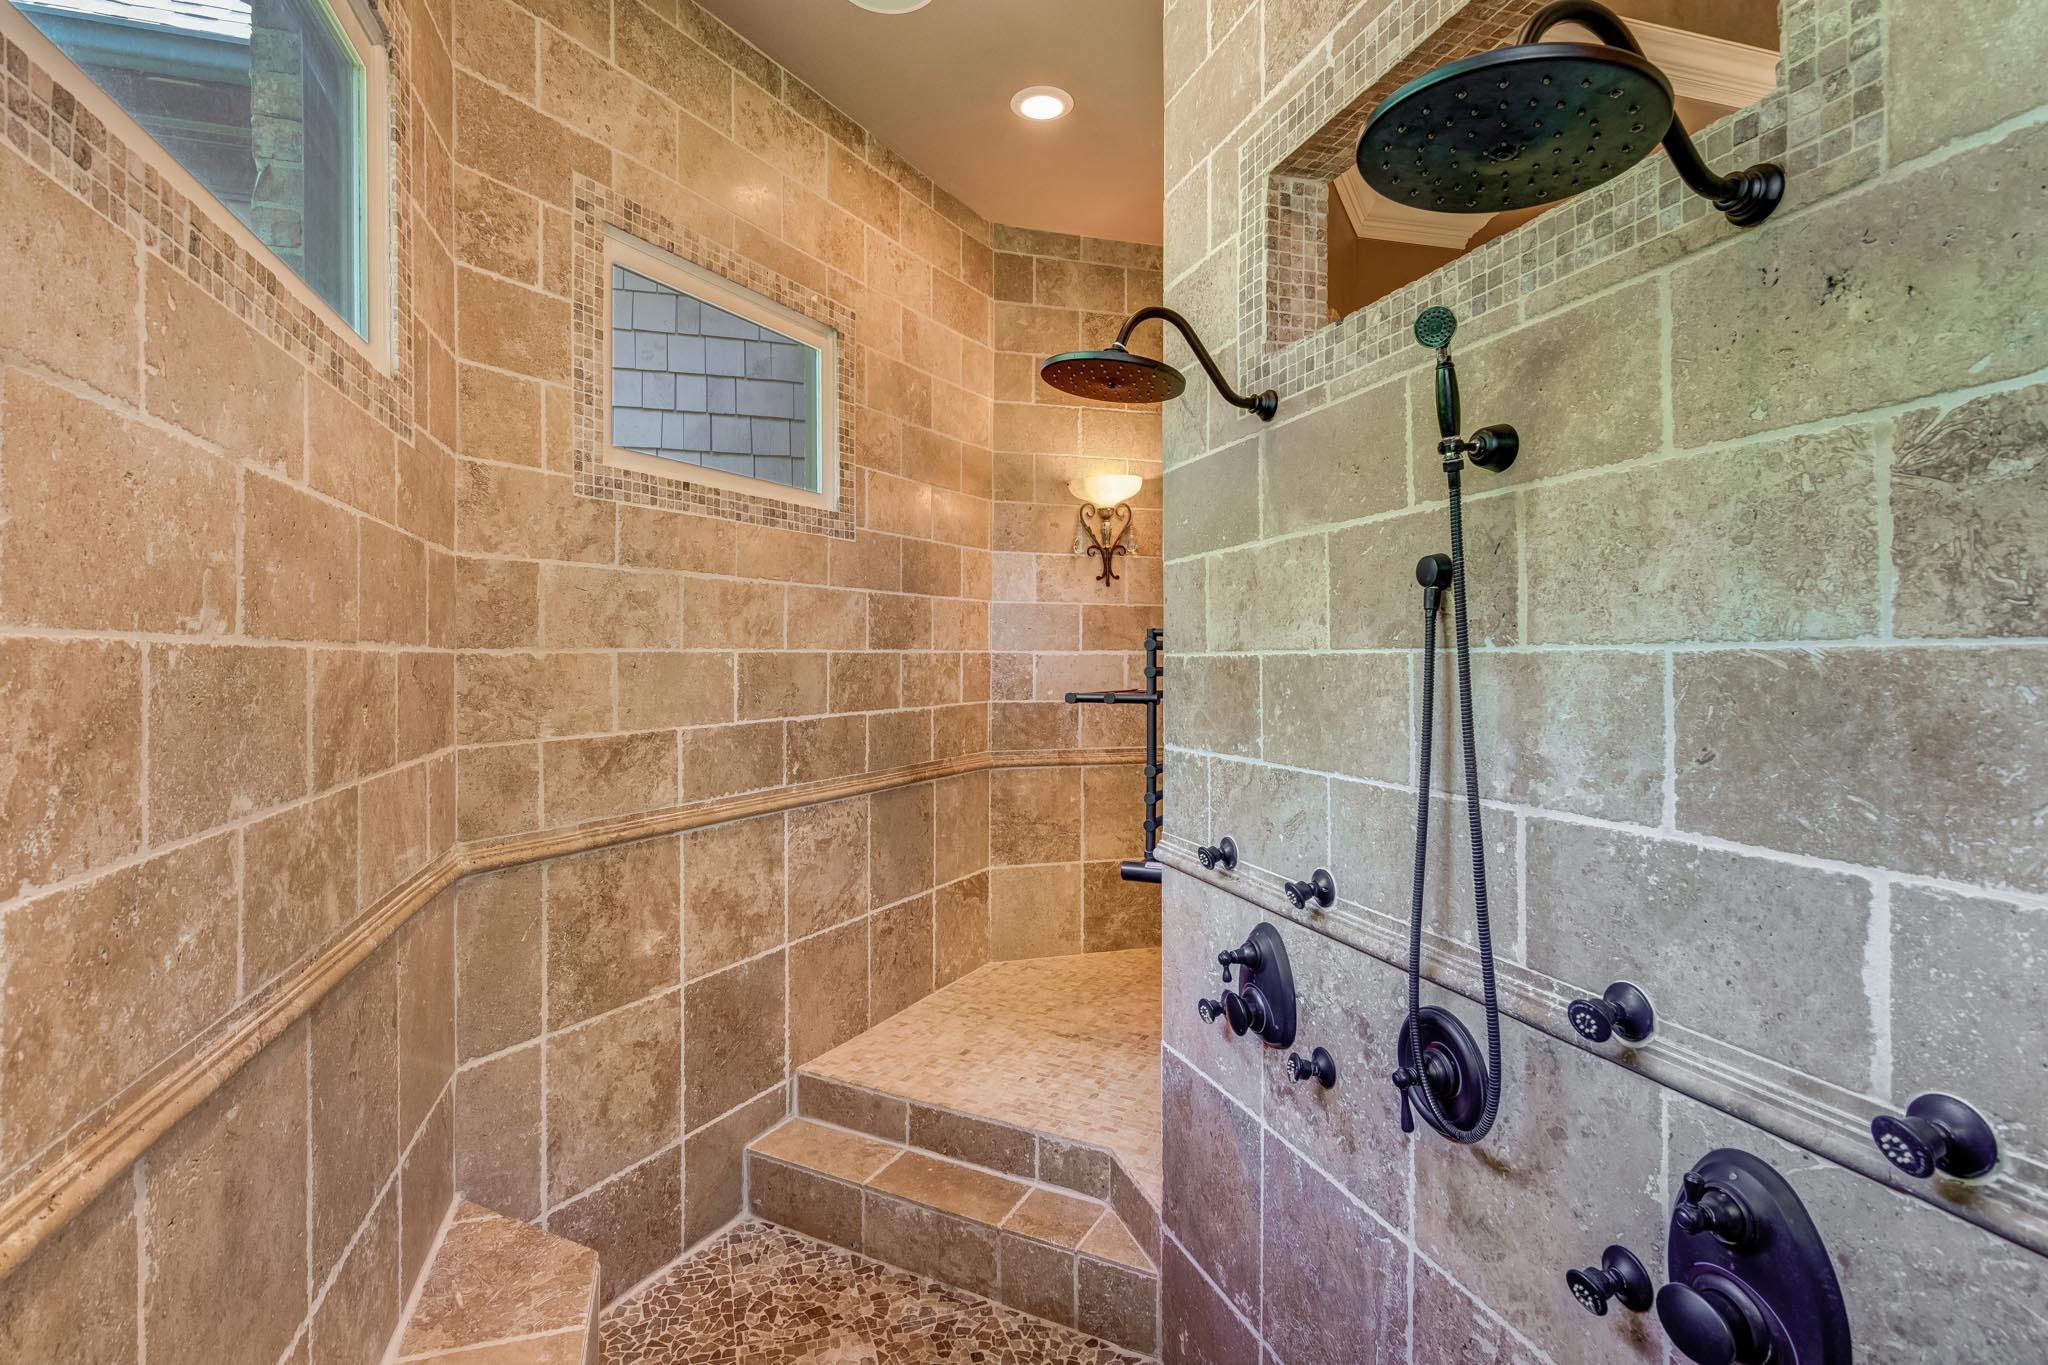 real_estate_photographer_bathroom_photography-8.jpg